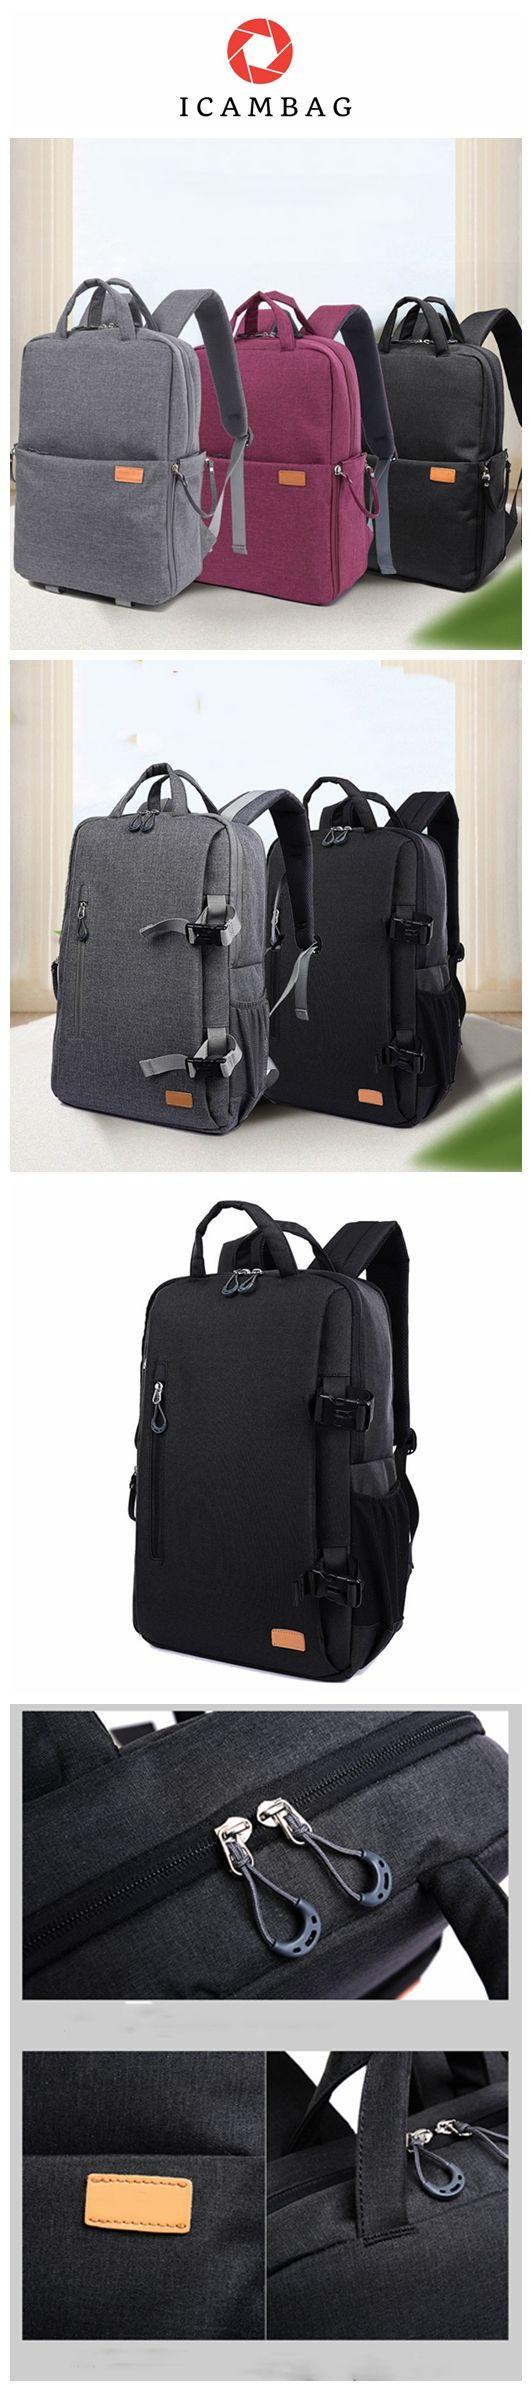 camera packs backpack 131